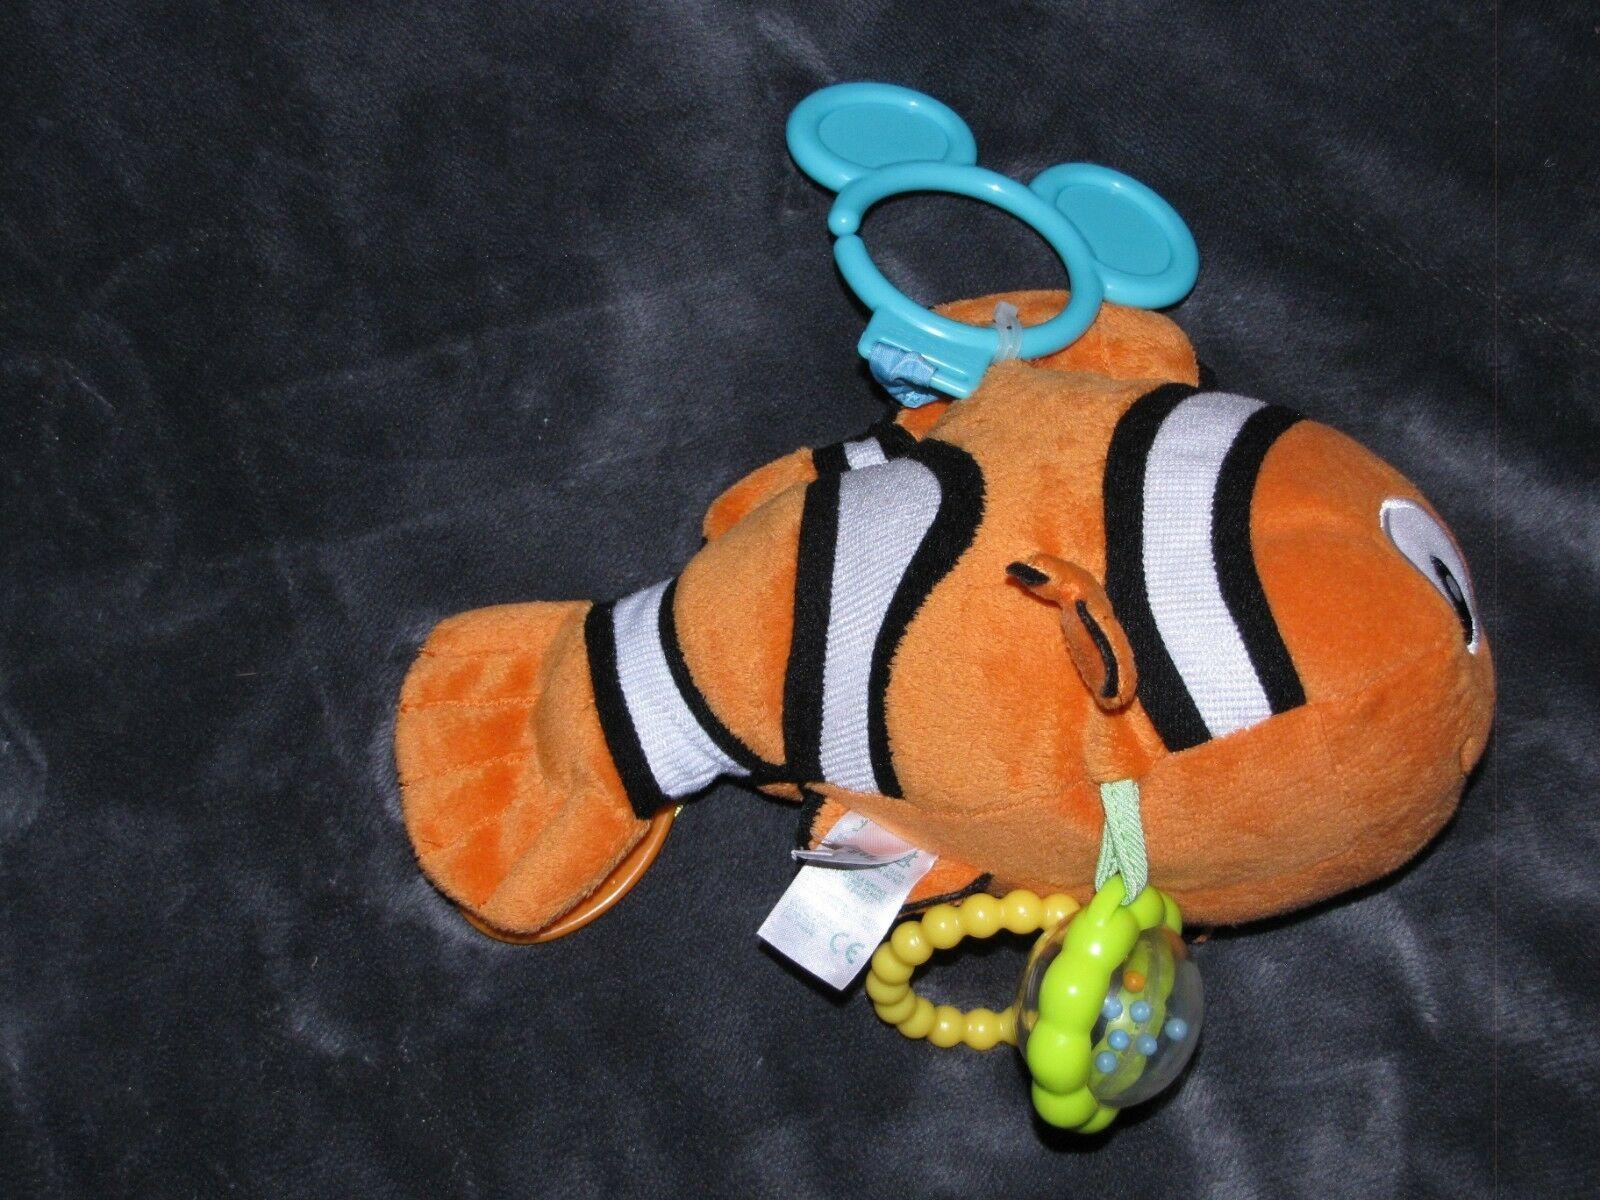 KIDS PREFERRED DISNEY BABY FINDING NEMO ORANGE CLOWNFISH CLOWN FISH RING TOY image 3